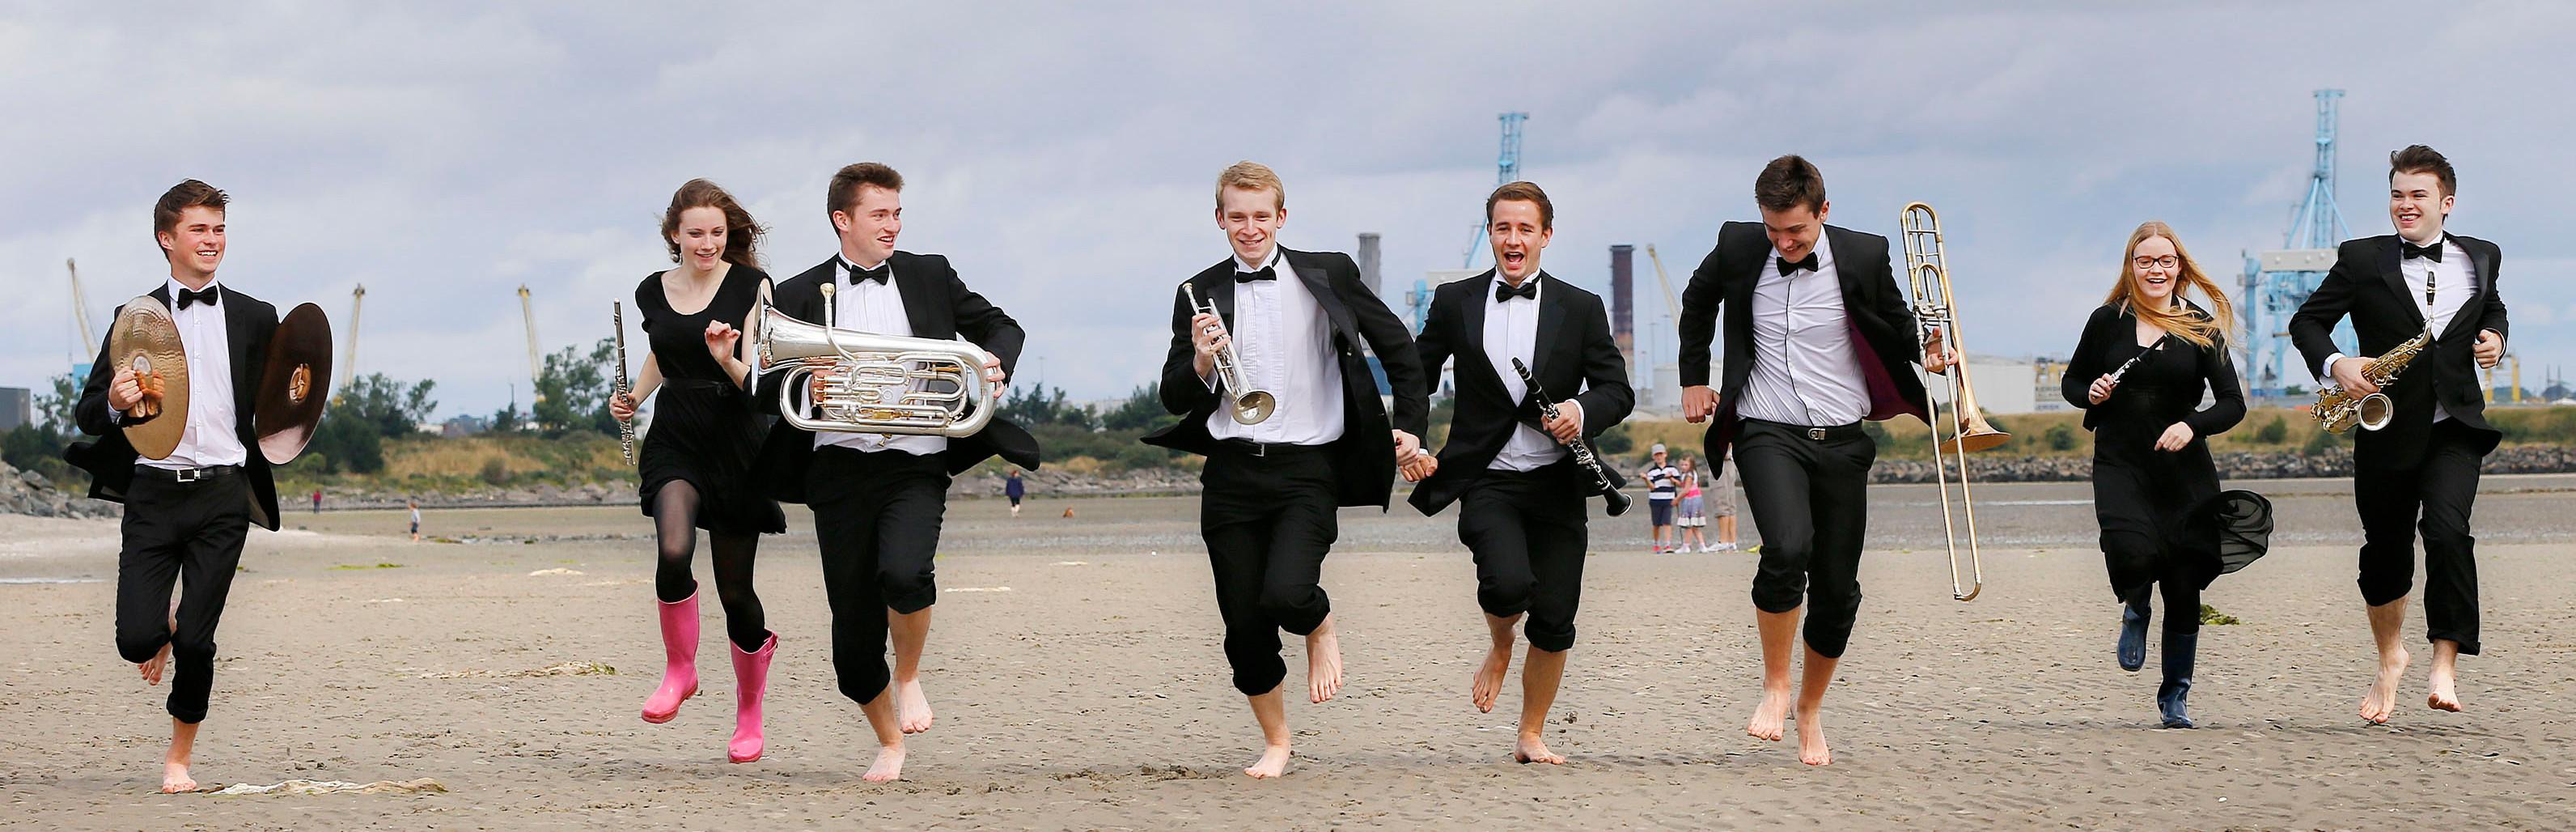 Irish Youth Wind Ensemble 2014